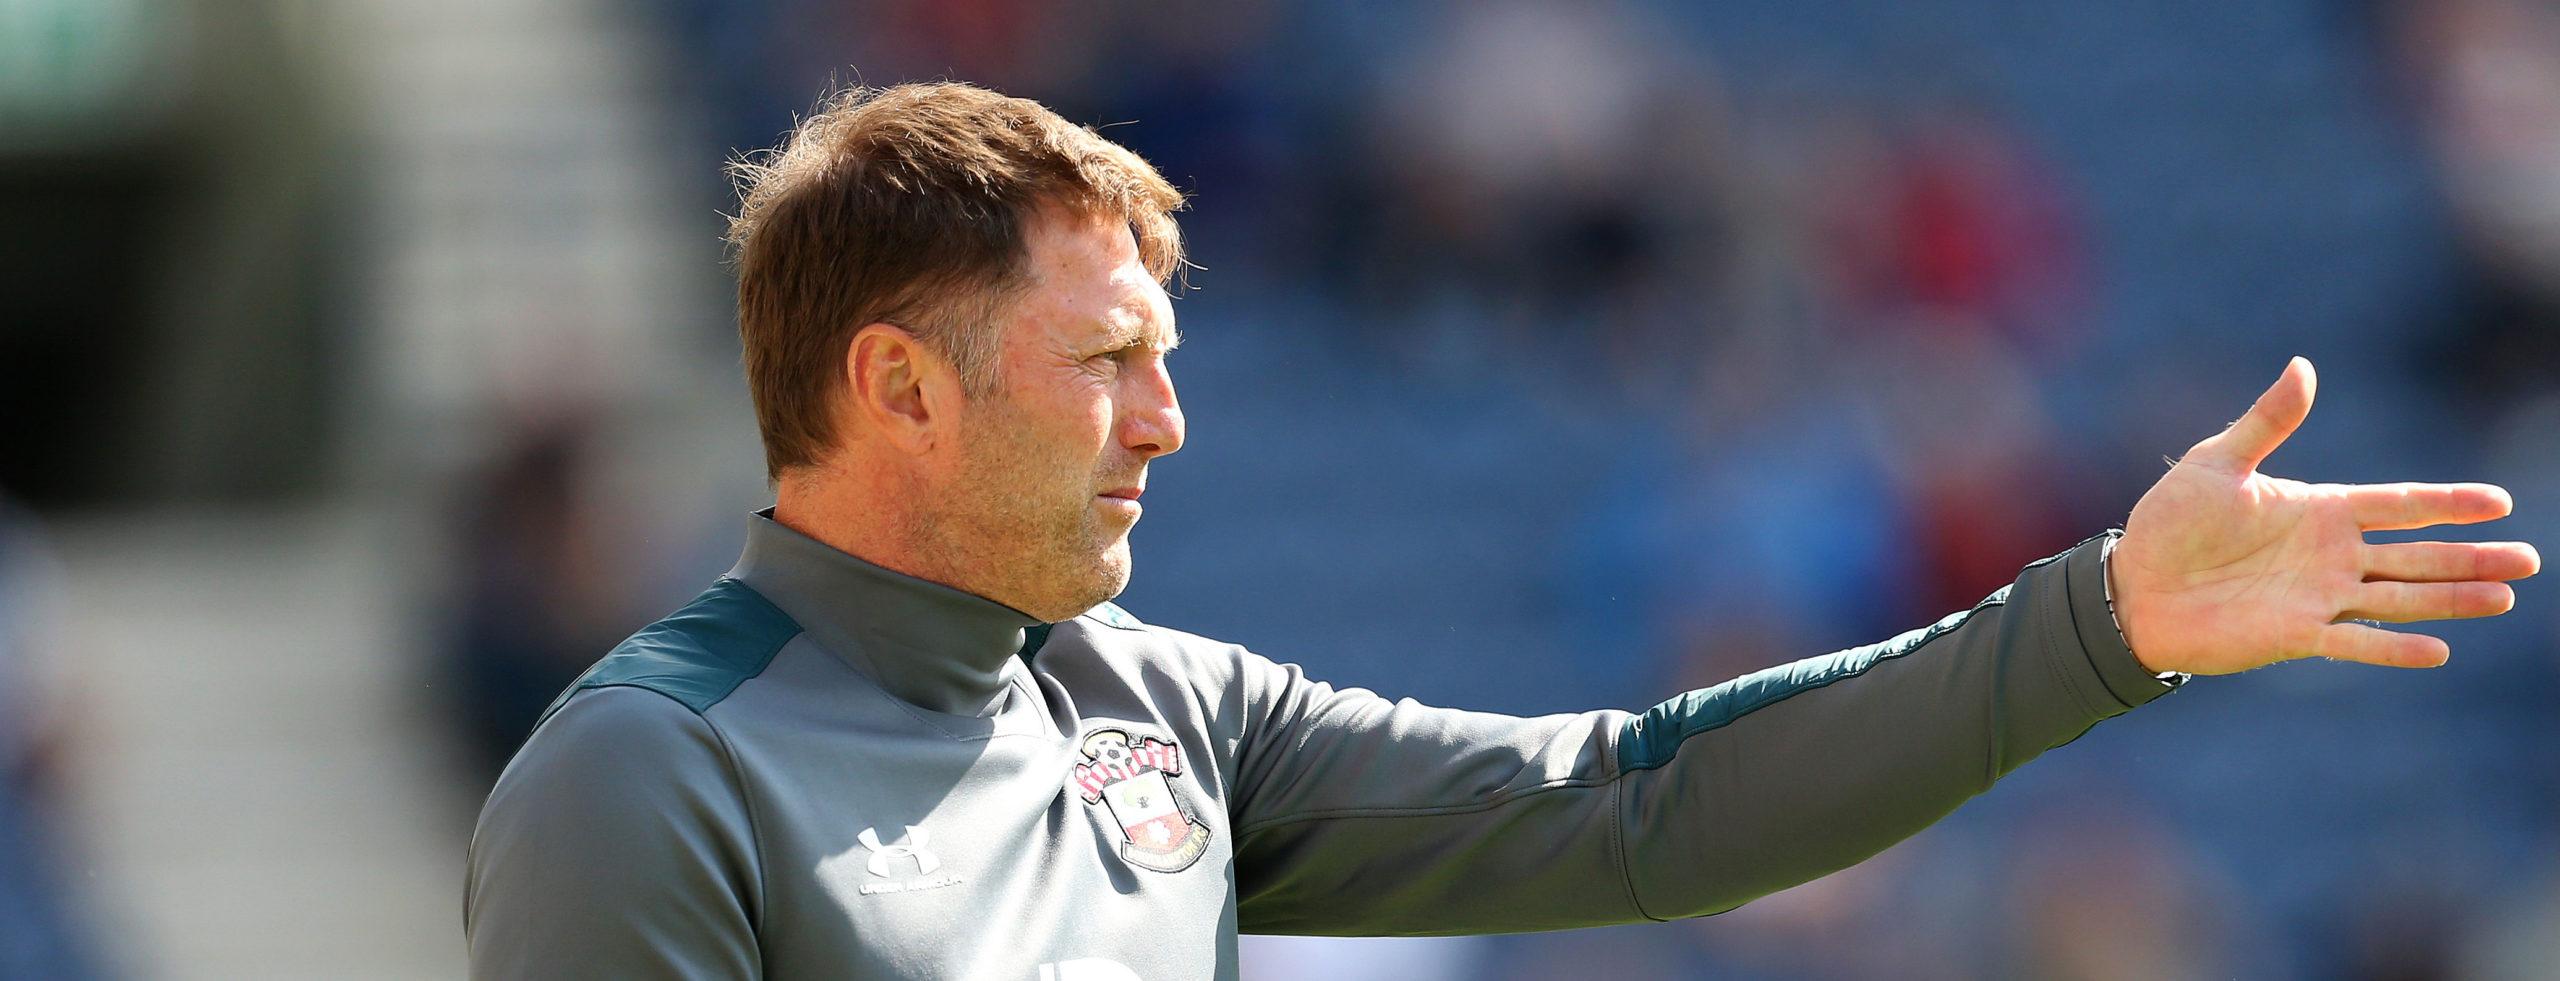 Sheff Utd vs Southampton: Saints ready for return to form